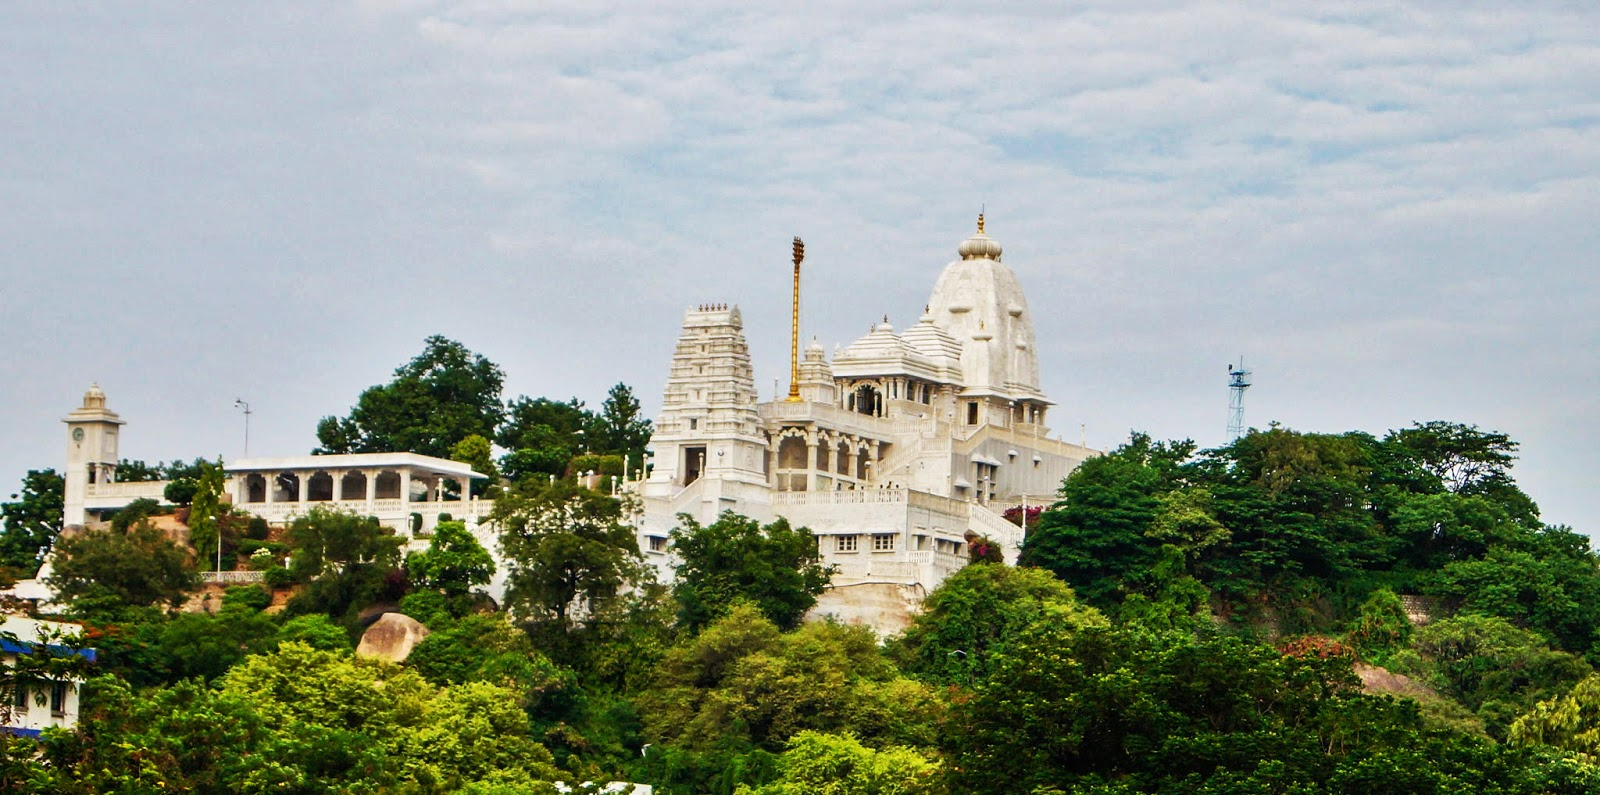 Birla Mandir Hyderabad India Travel Life Journeys